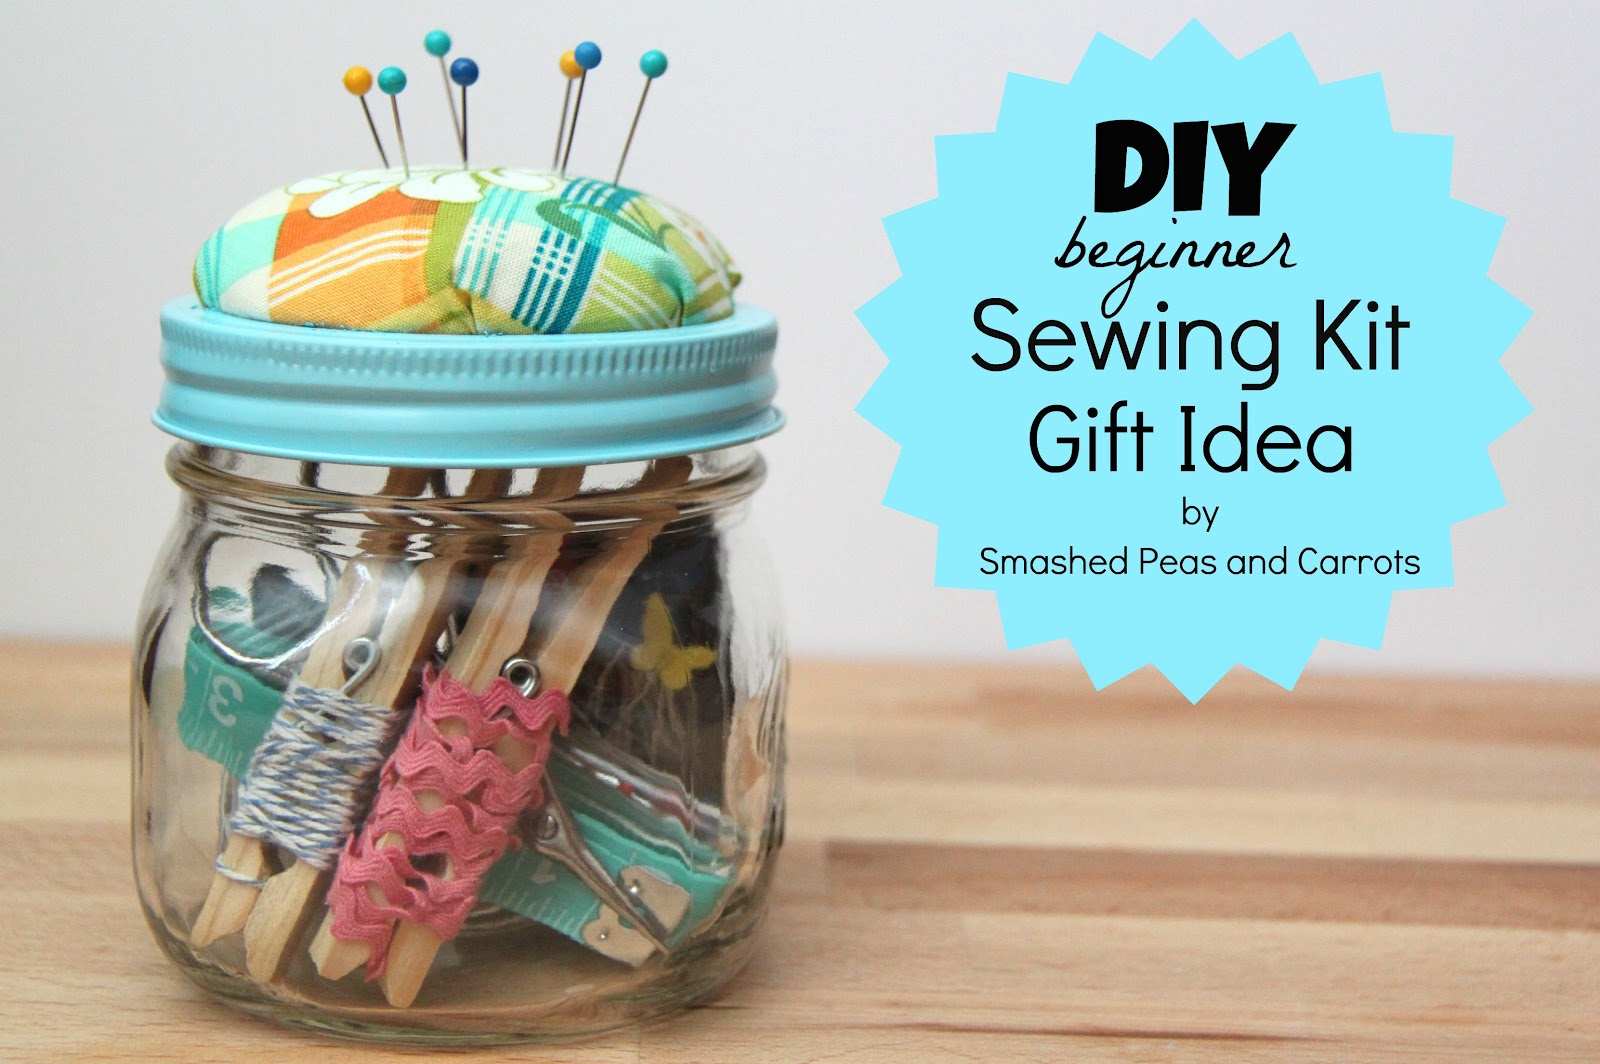 Home Design Gift Ideas: DIY Beginner Sewing Kit Gift Idea-TUTORIAL